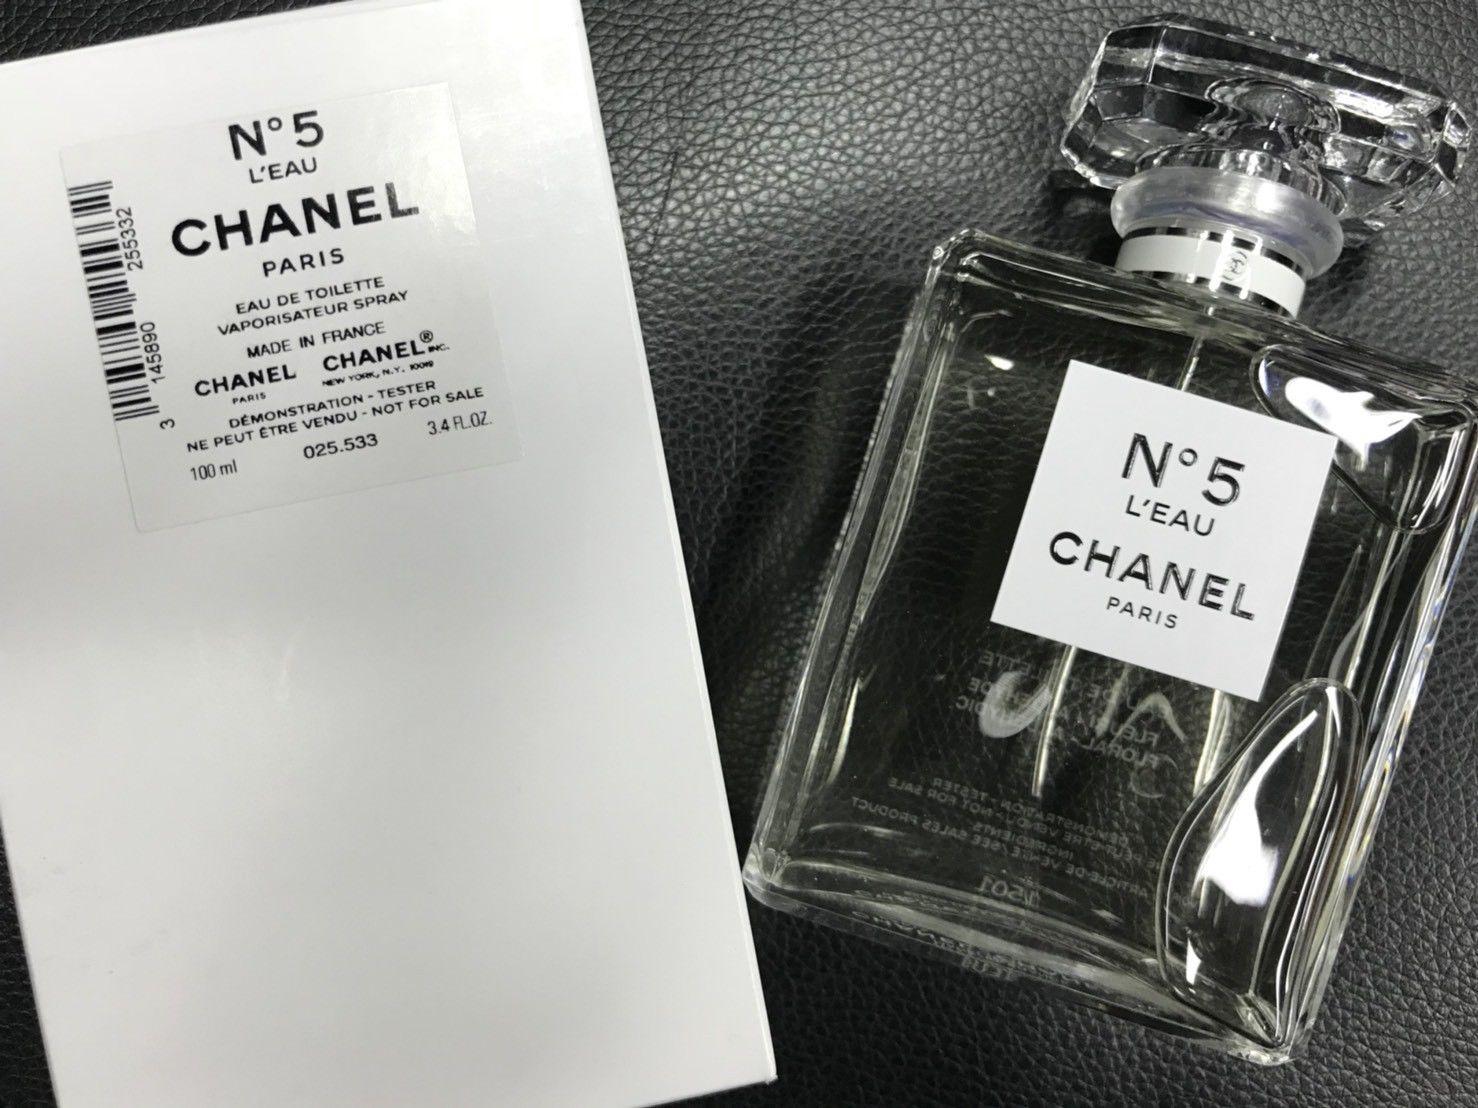 Chanel N5 Leau Womens Perfume White Box And 50 Similar Items No 5 Women Edp 100ml S L1600